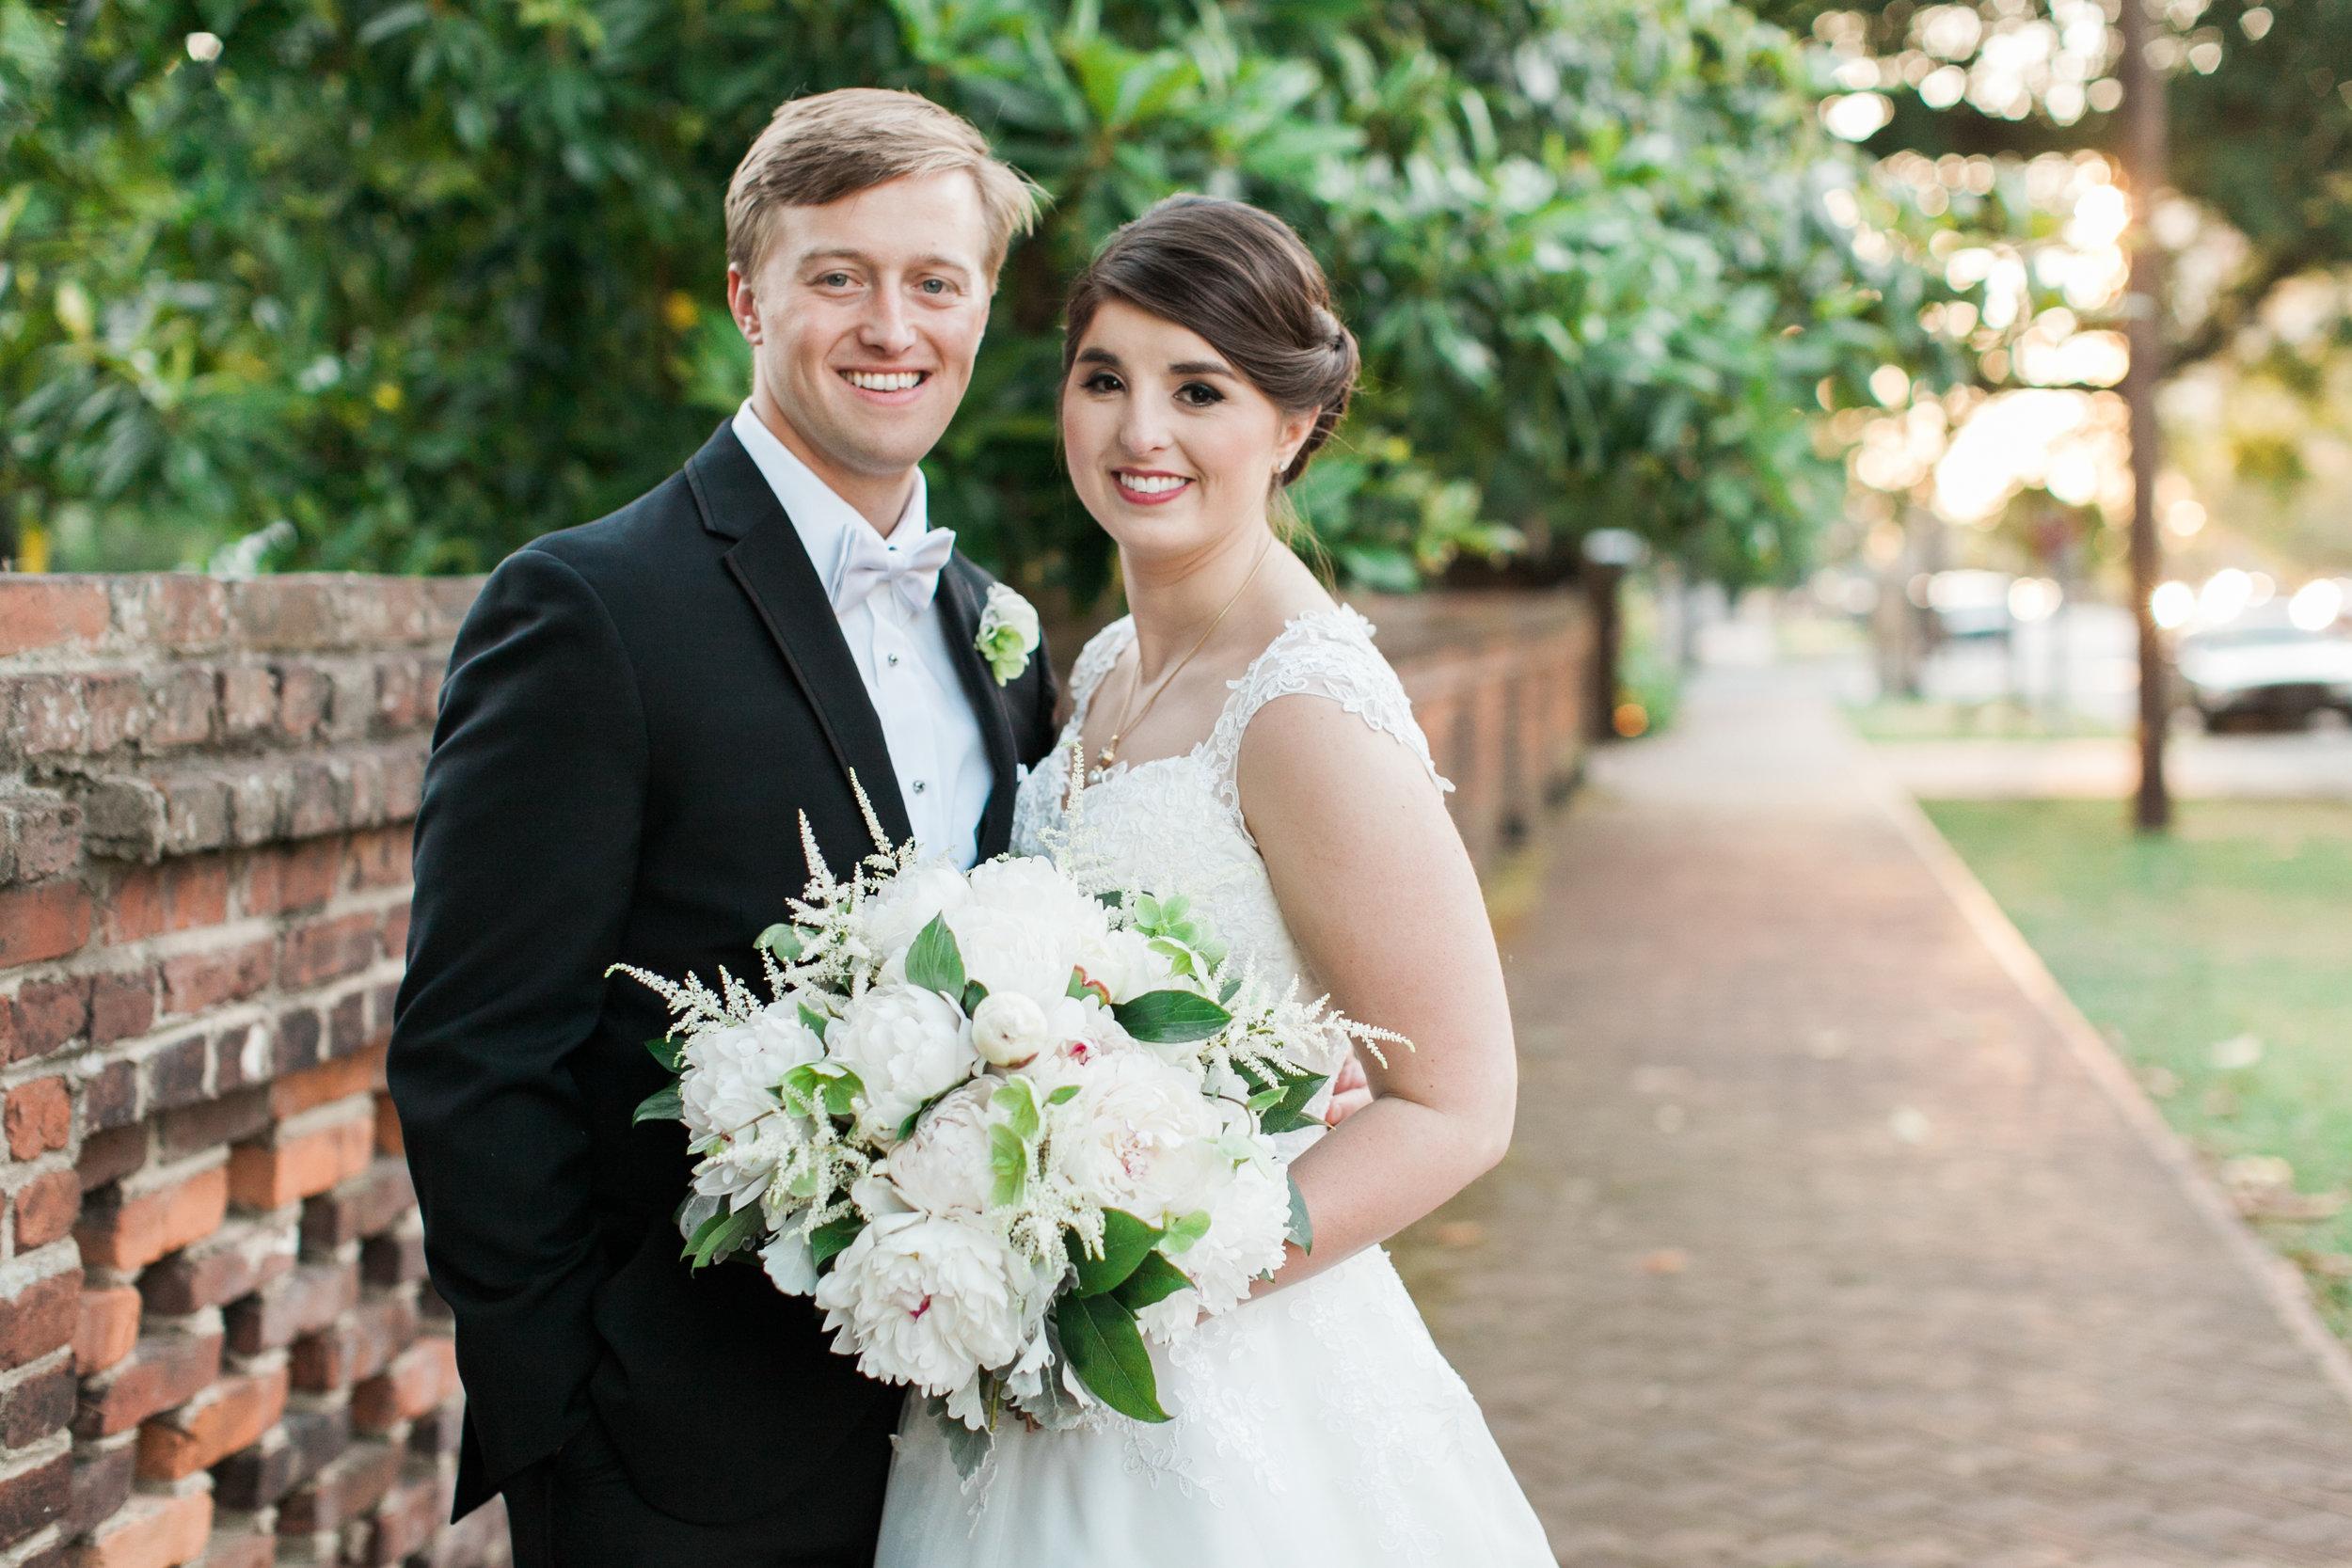 bride-groom-OMC-wedding-greg-boulus-events-augusta-georgia